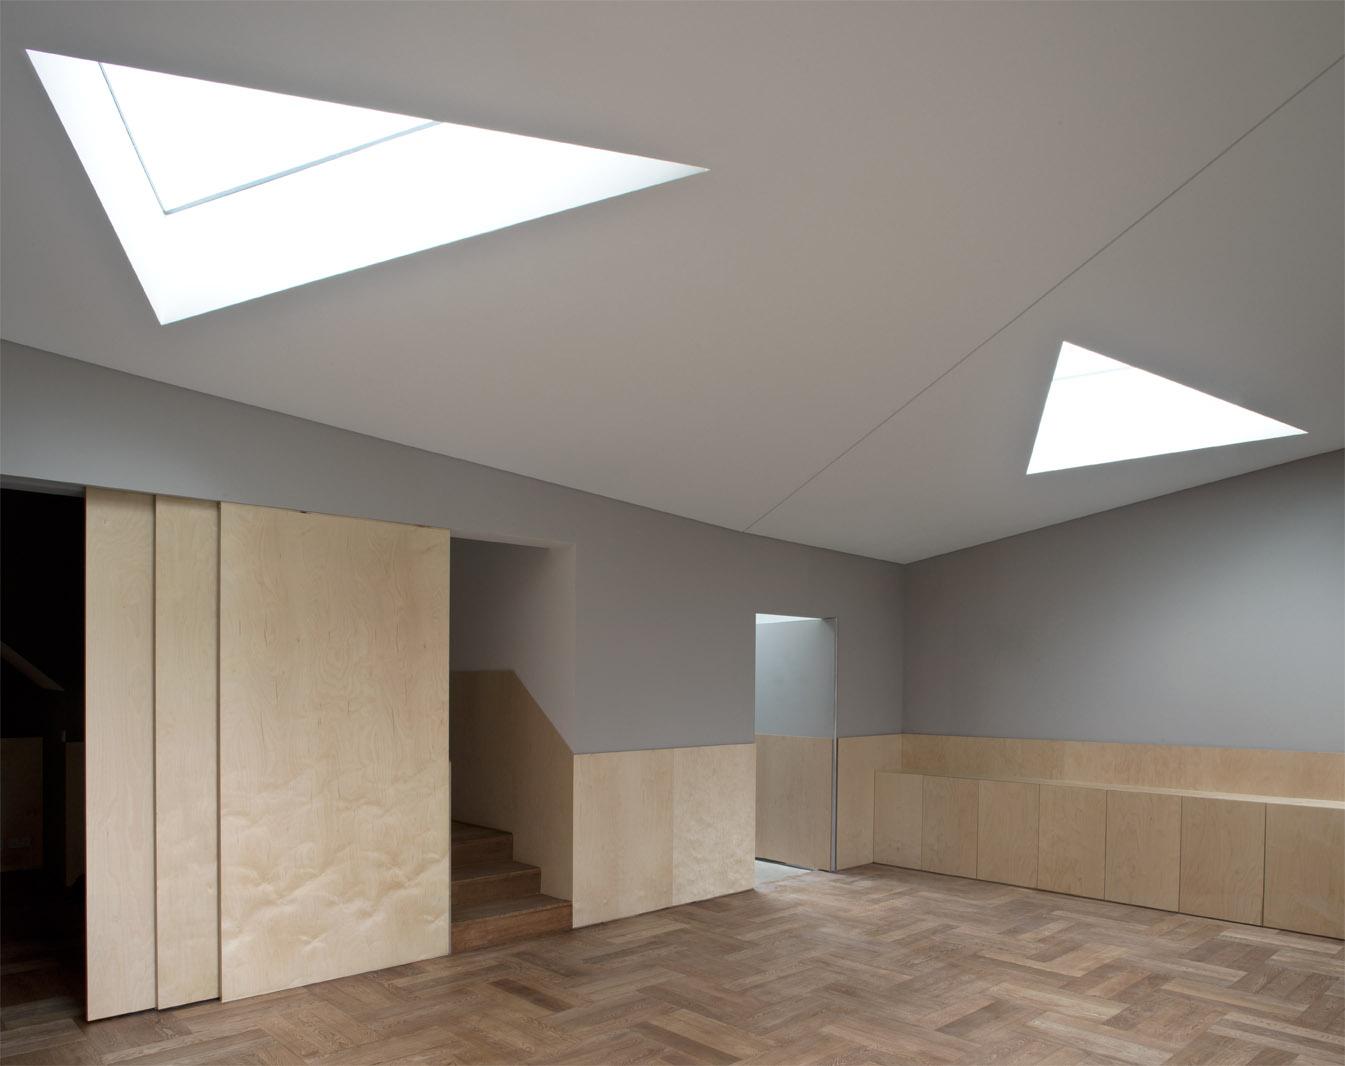 MOCT_house_extension_barnham rd_image12.jpg